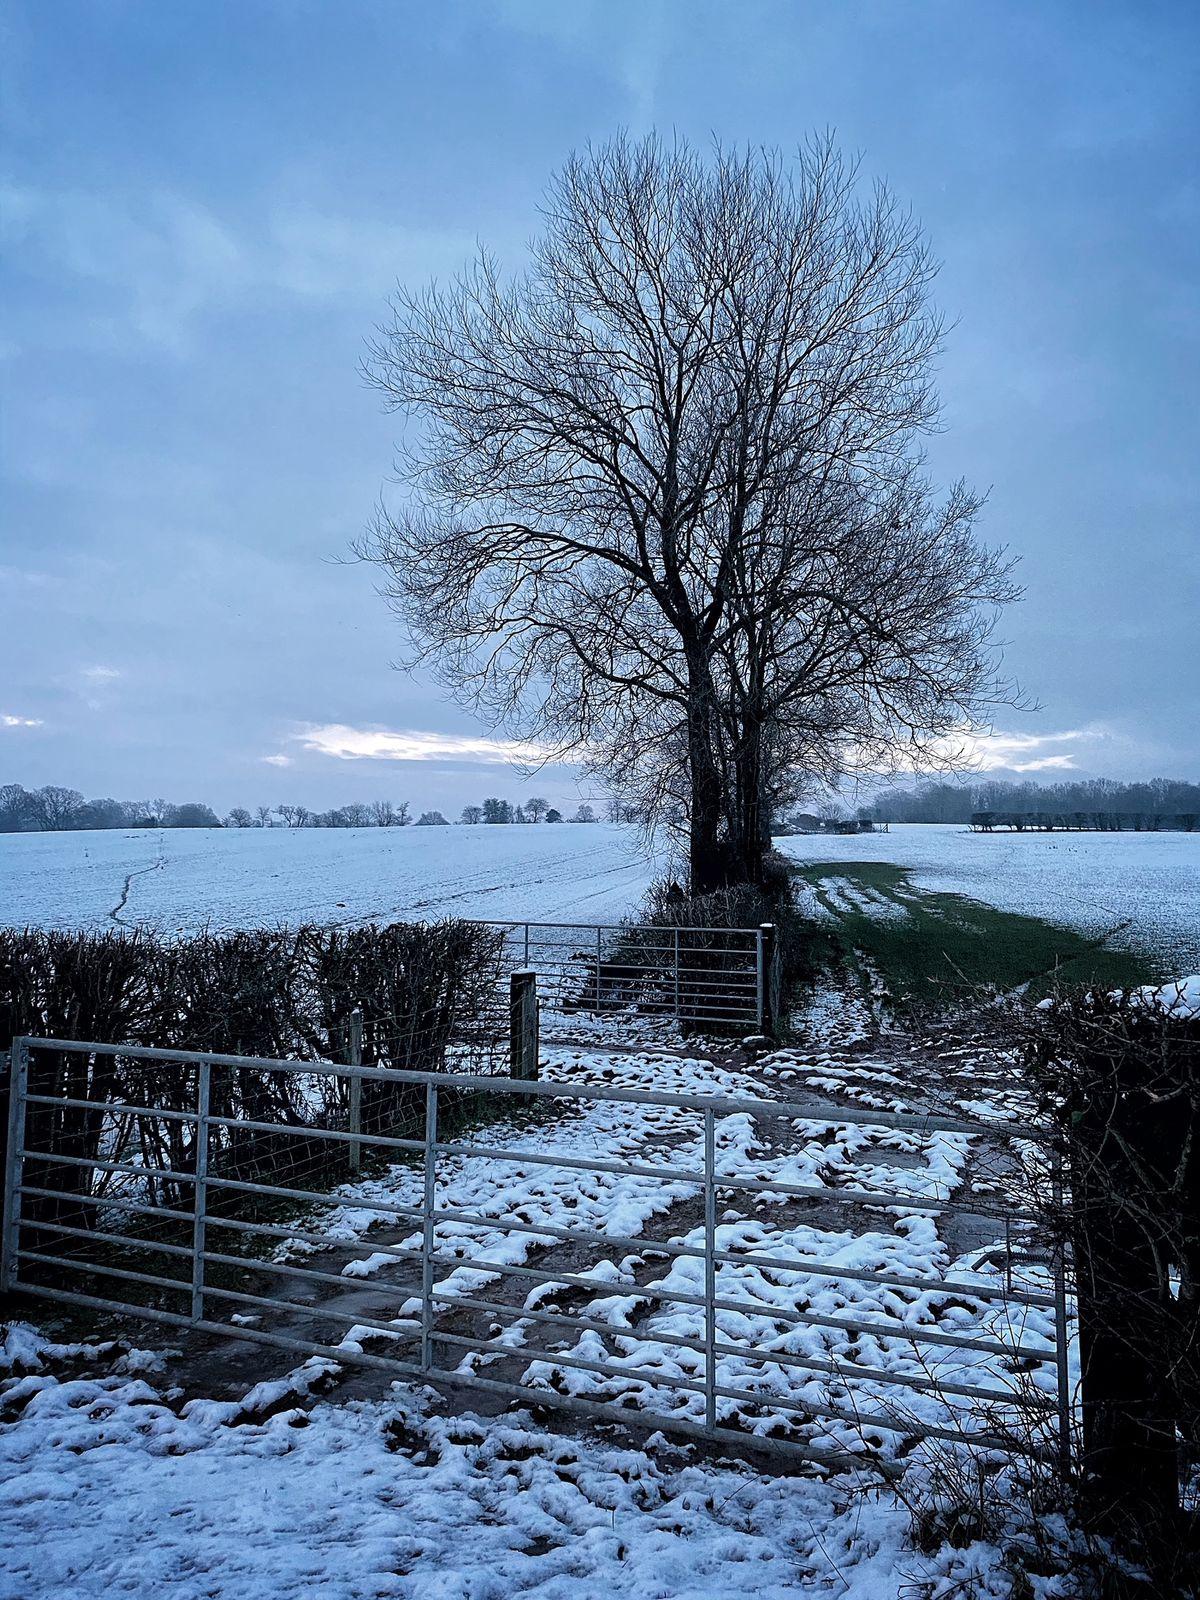 Alverley, near Bridgnorth. Pic:Jim Harrison.